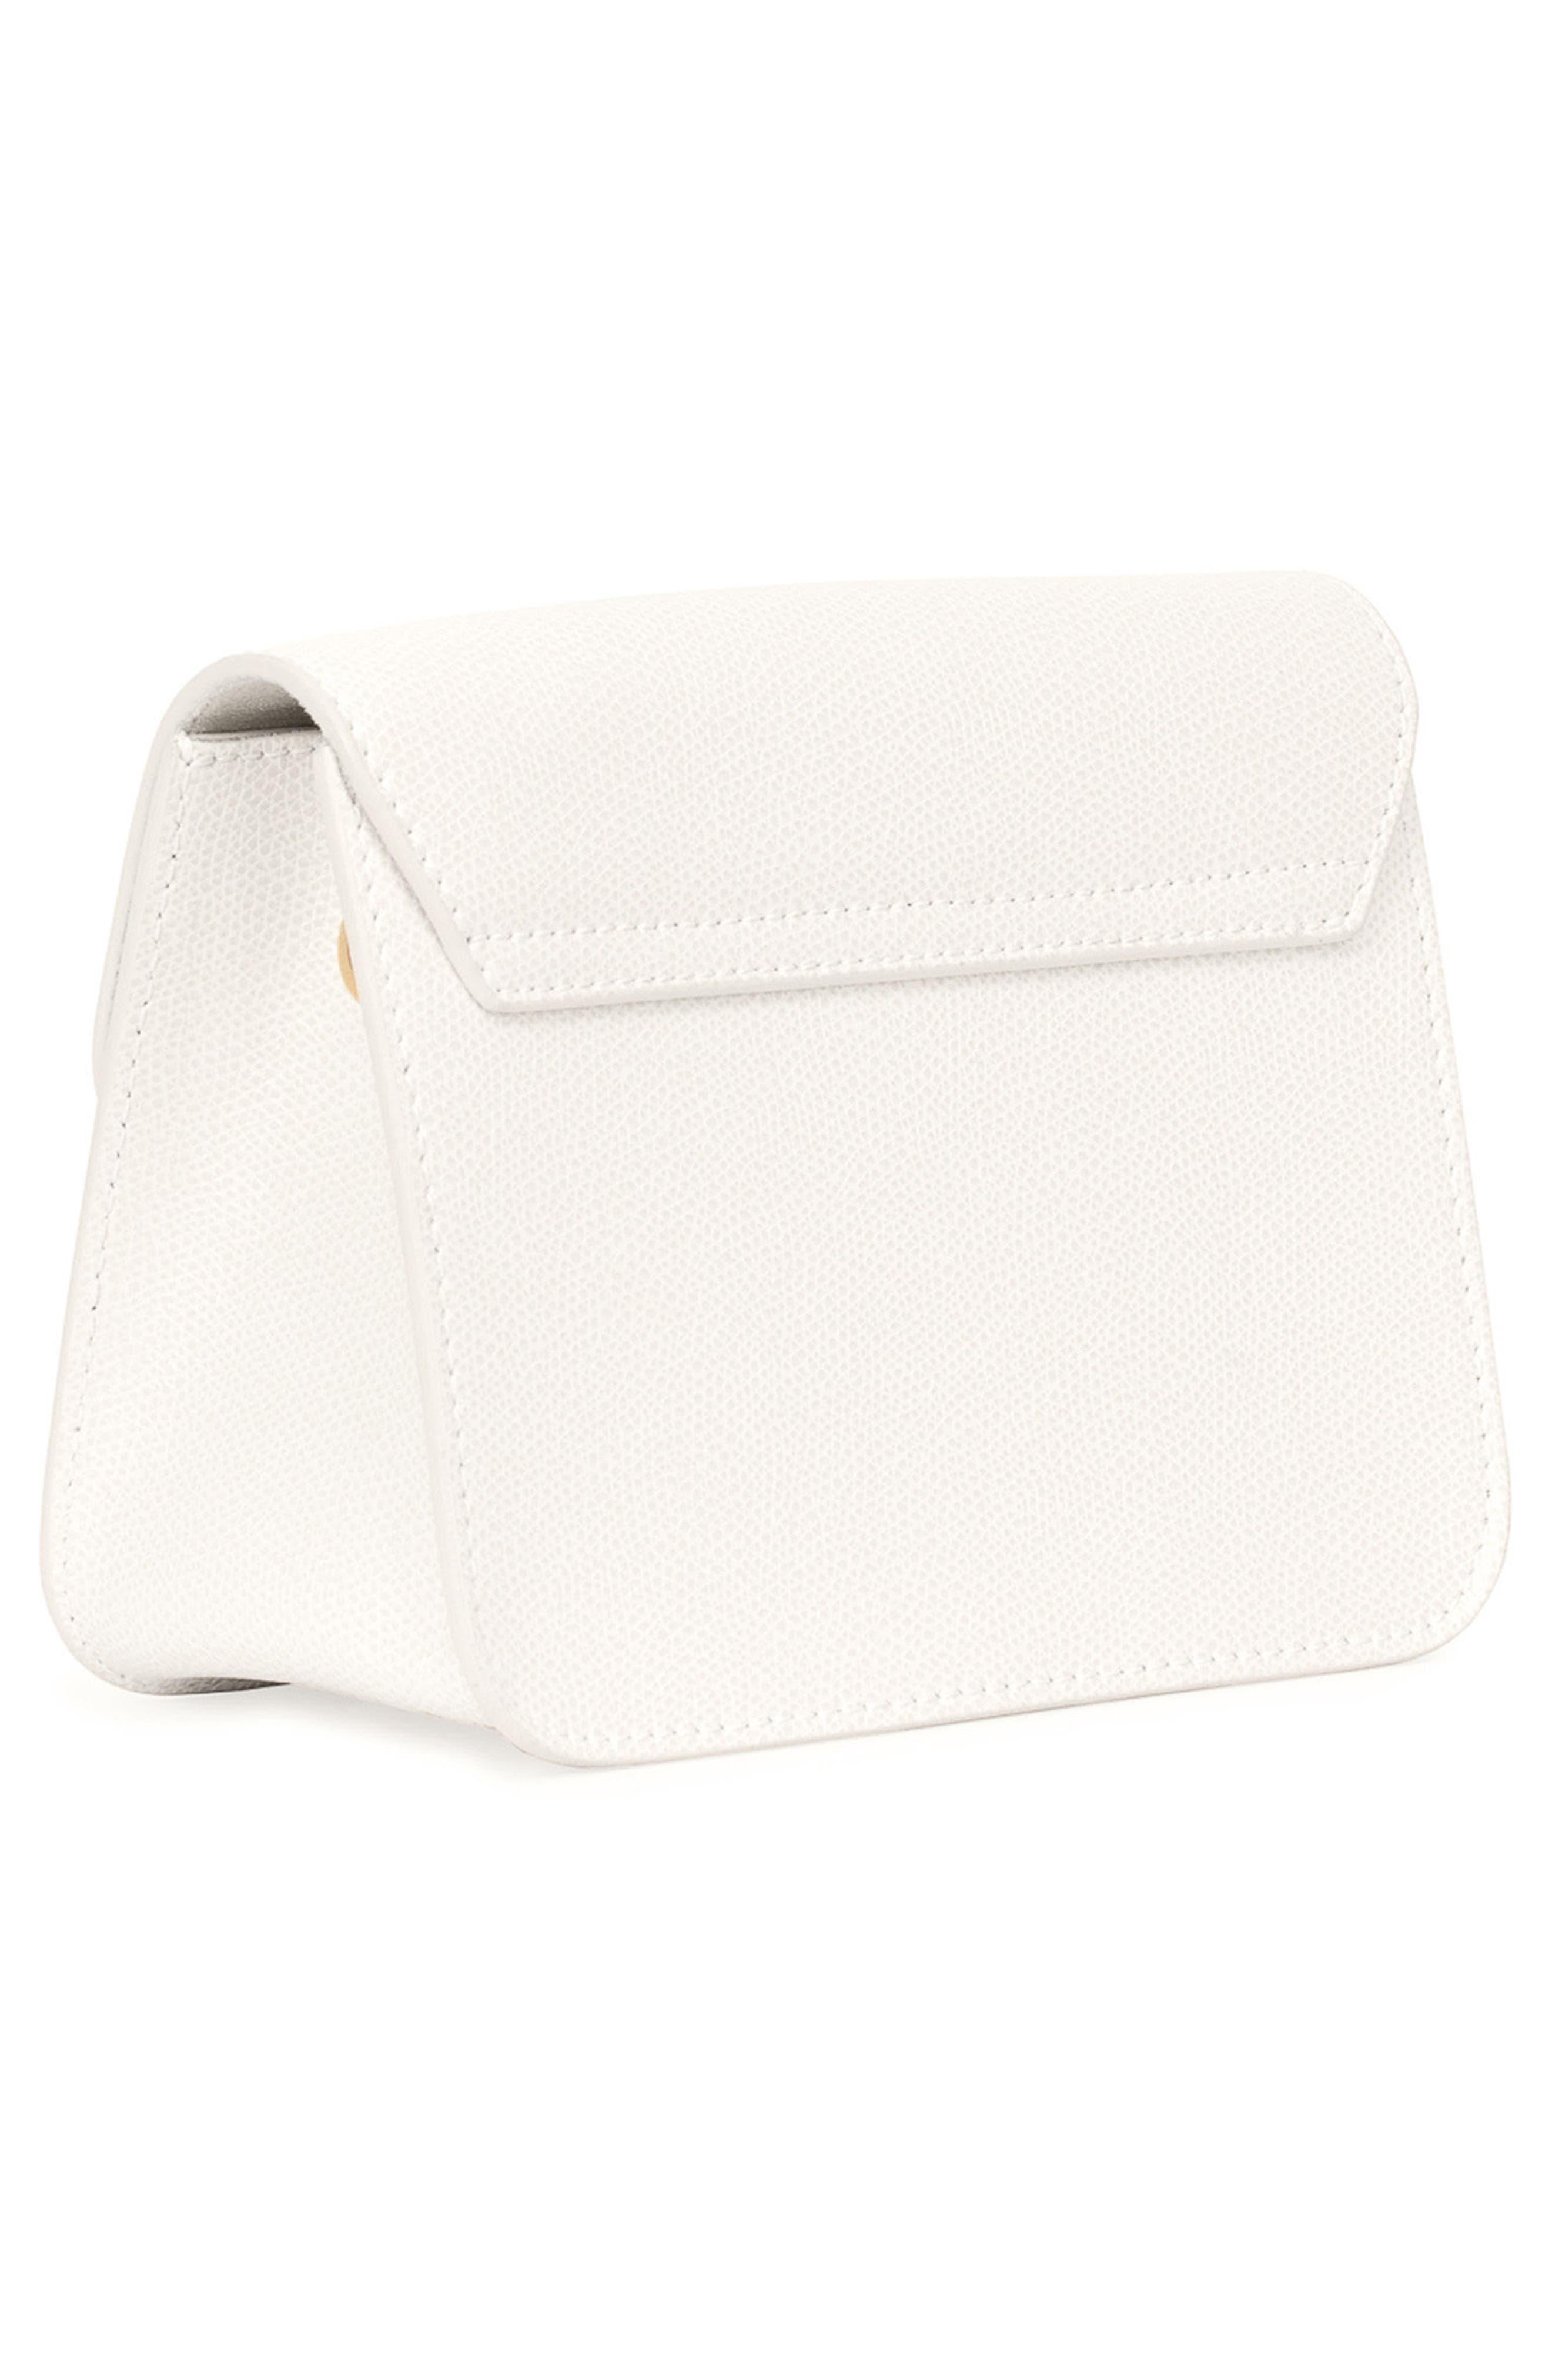 Mini Metropolis Leather Crossbody Bag,                             Alternate thumbnail 2, color,                             100